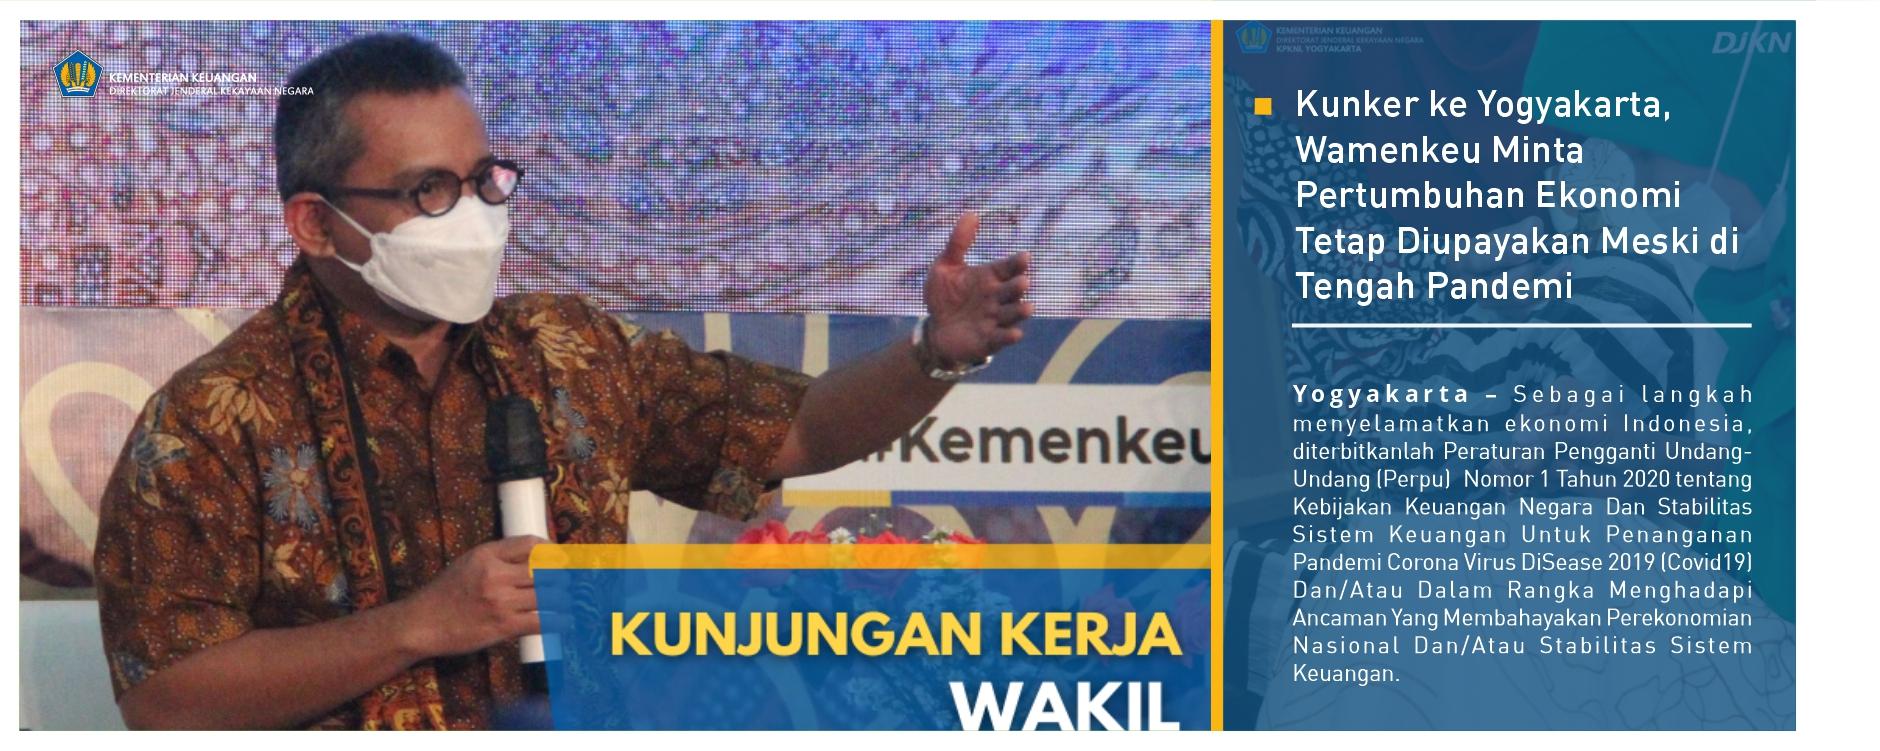 Kunker ke Yogyakarta, Wamenkeu Minta Pertumbuhan Ekonomi Tetap Diupayakan Meski di Tengah Pandemi